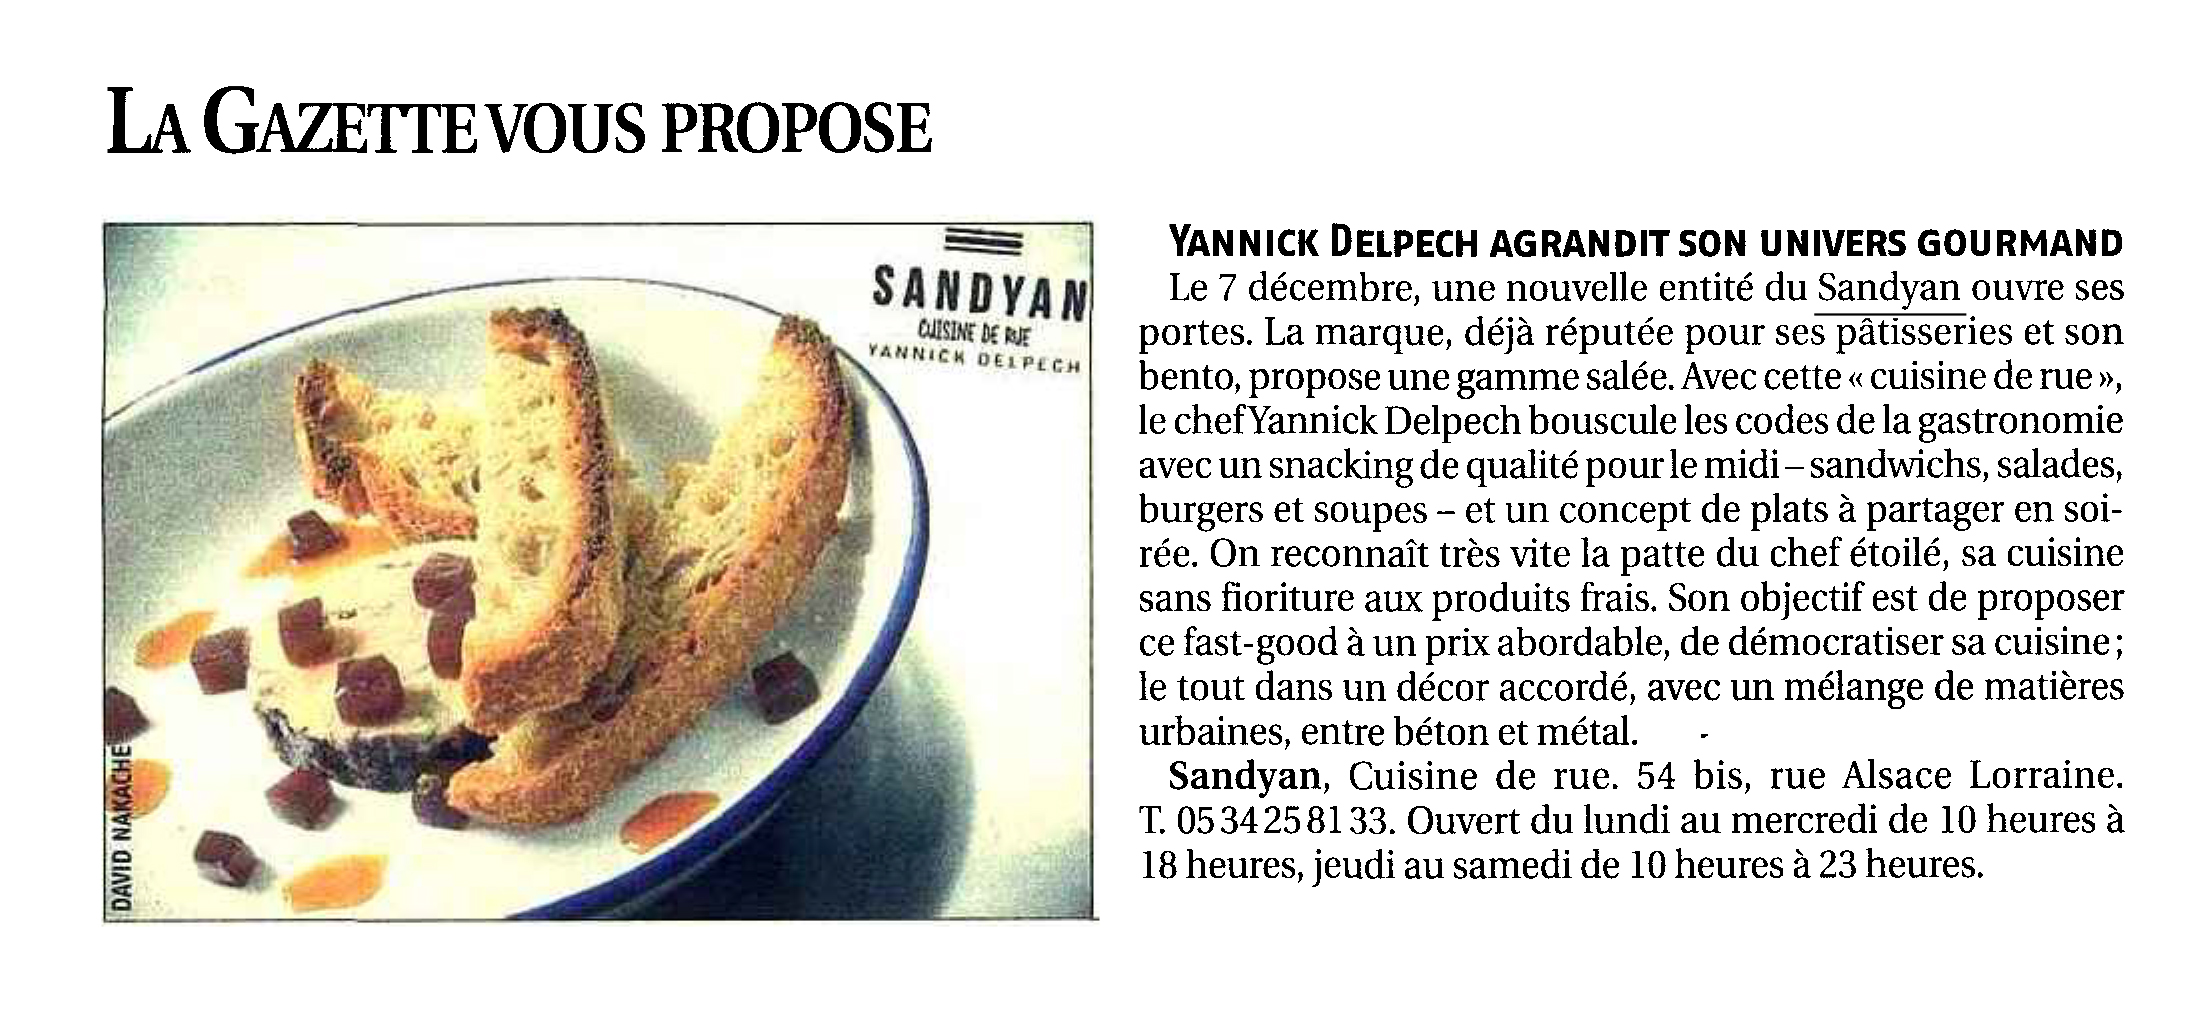 Yannick Delpech agrandit son univers gourmand – La Gazette du Midi 07-12-2015